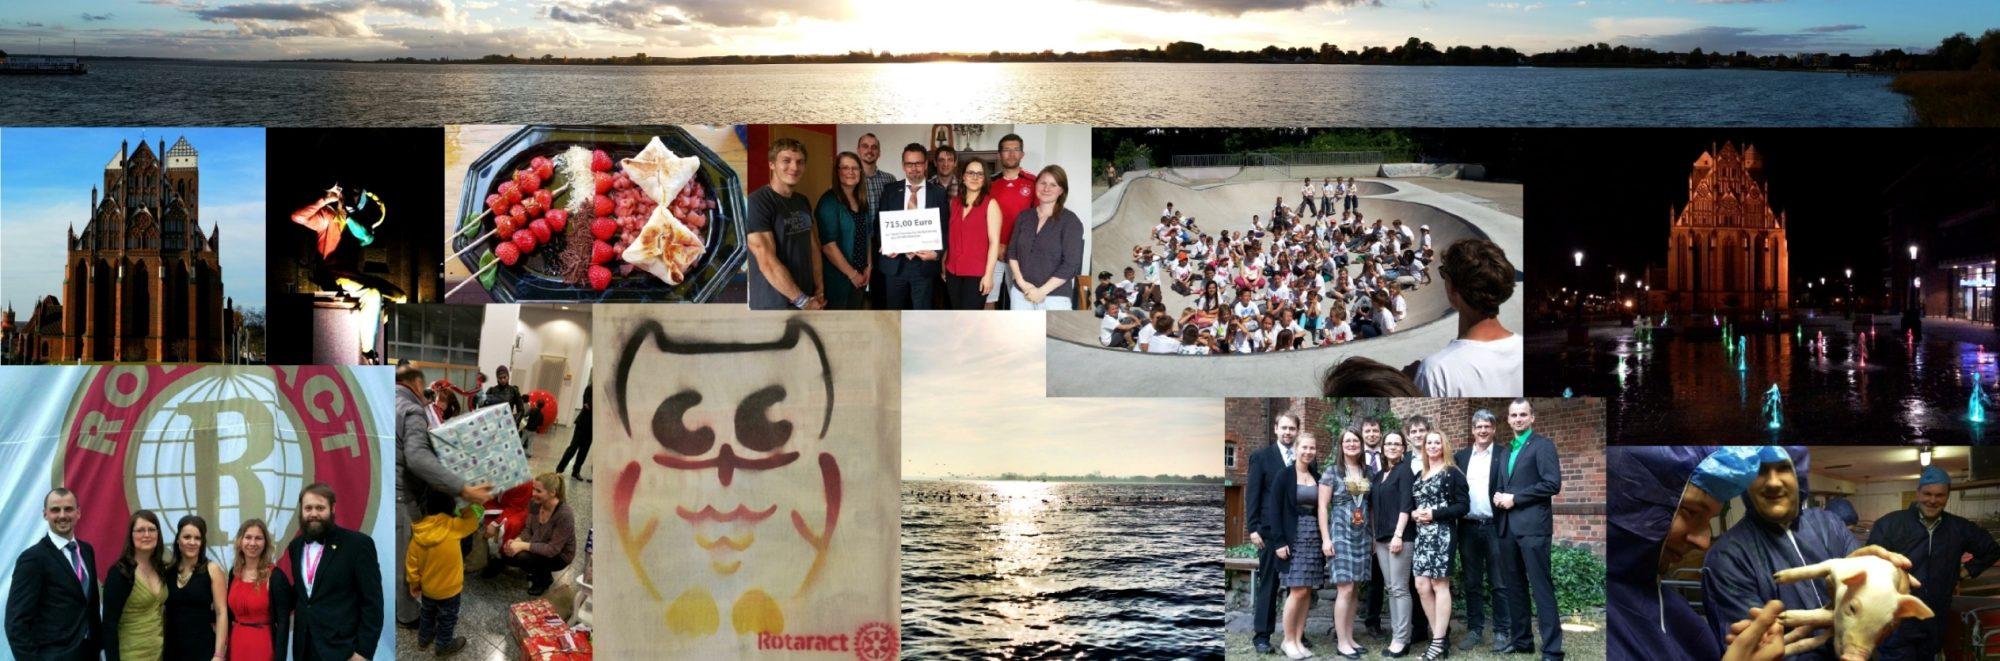 Rotaract Club Prenzlau